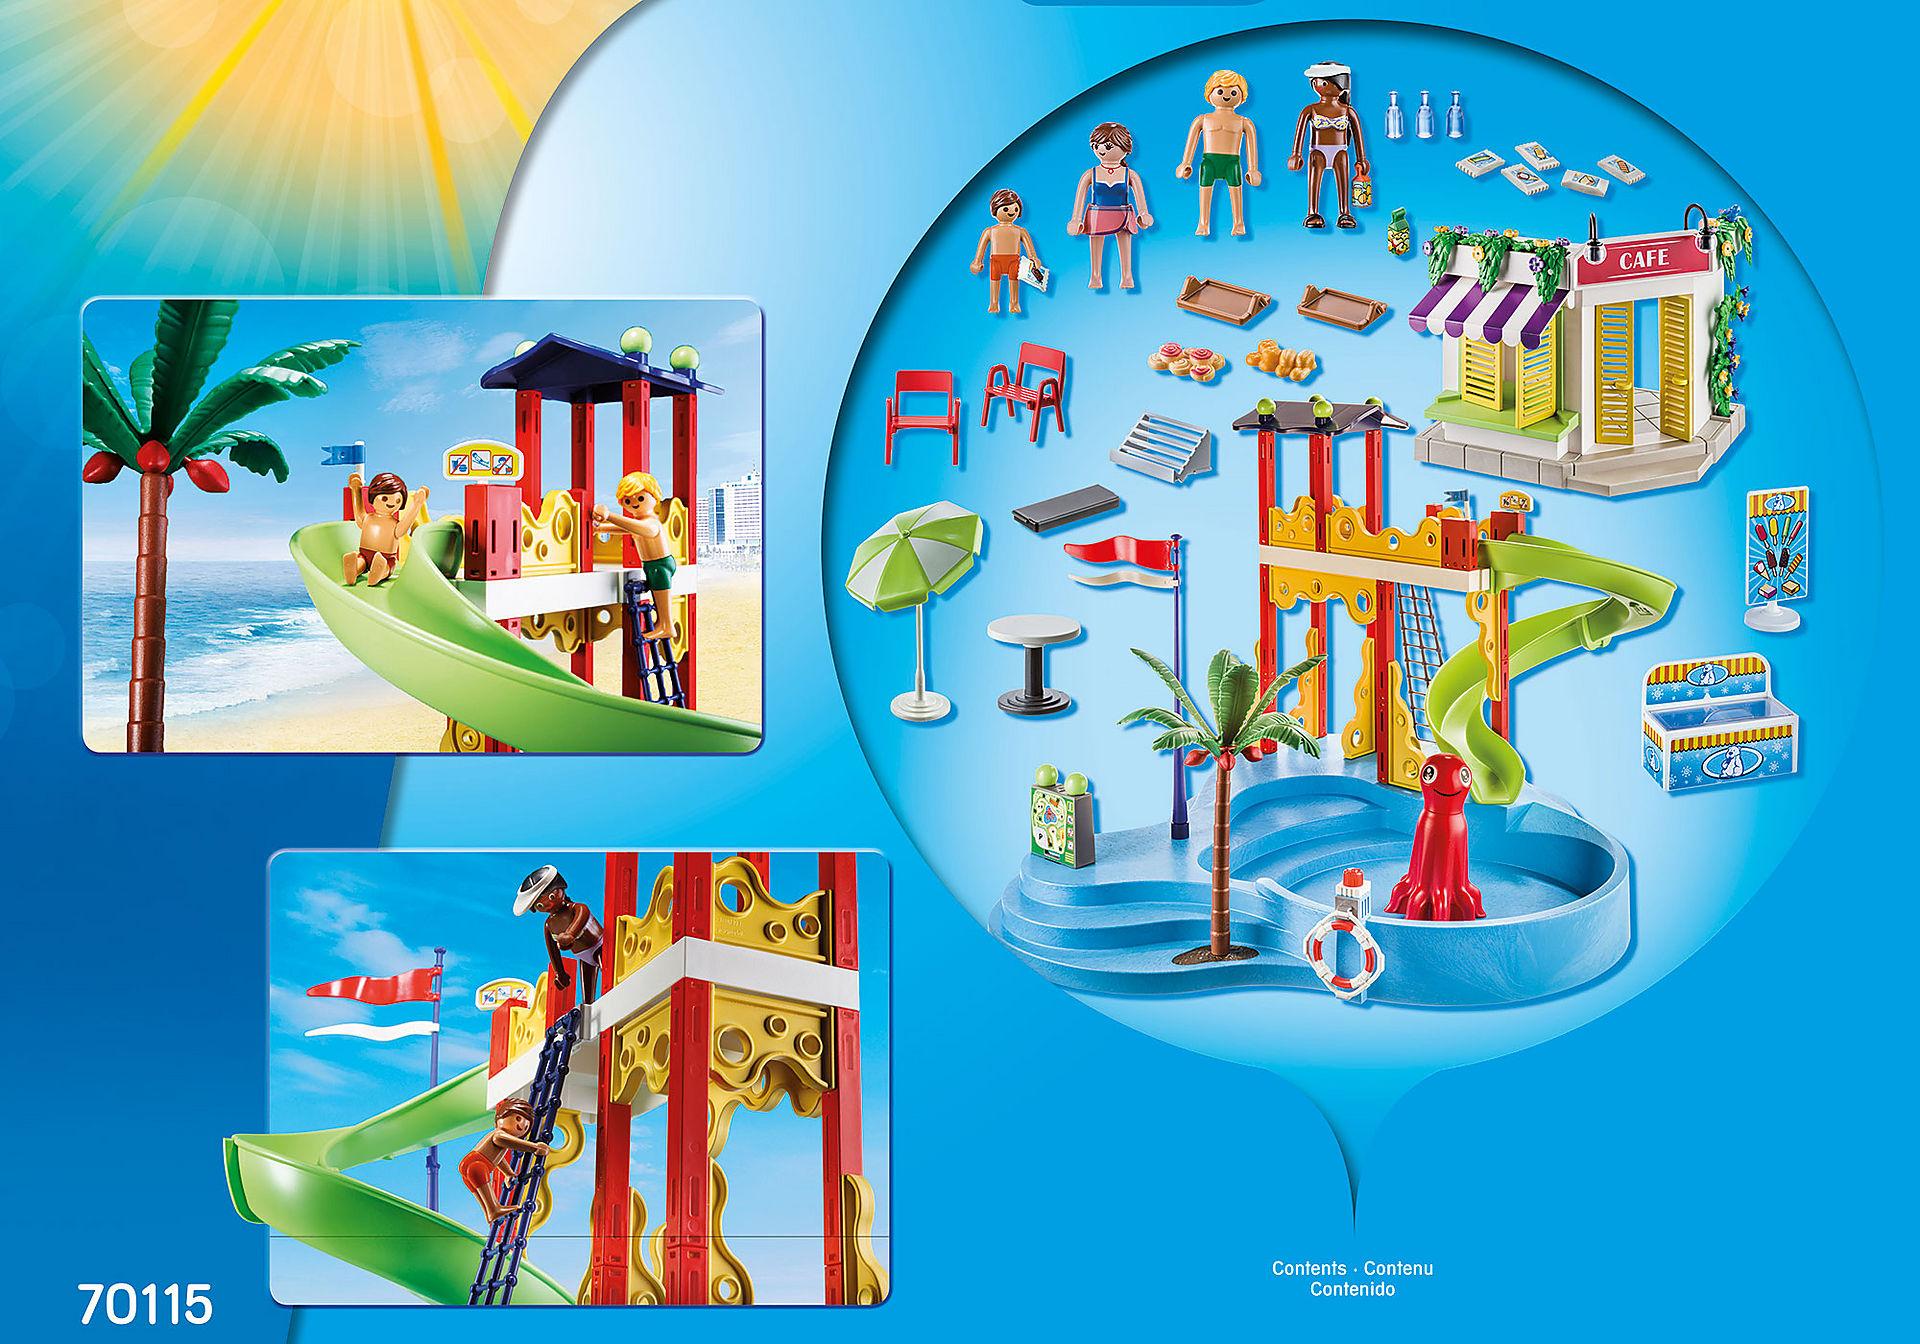 70115 Aquapark mit Café zoom image3